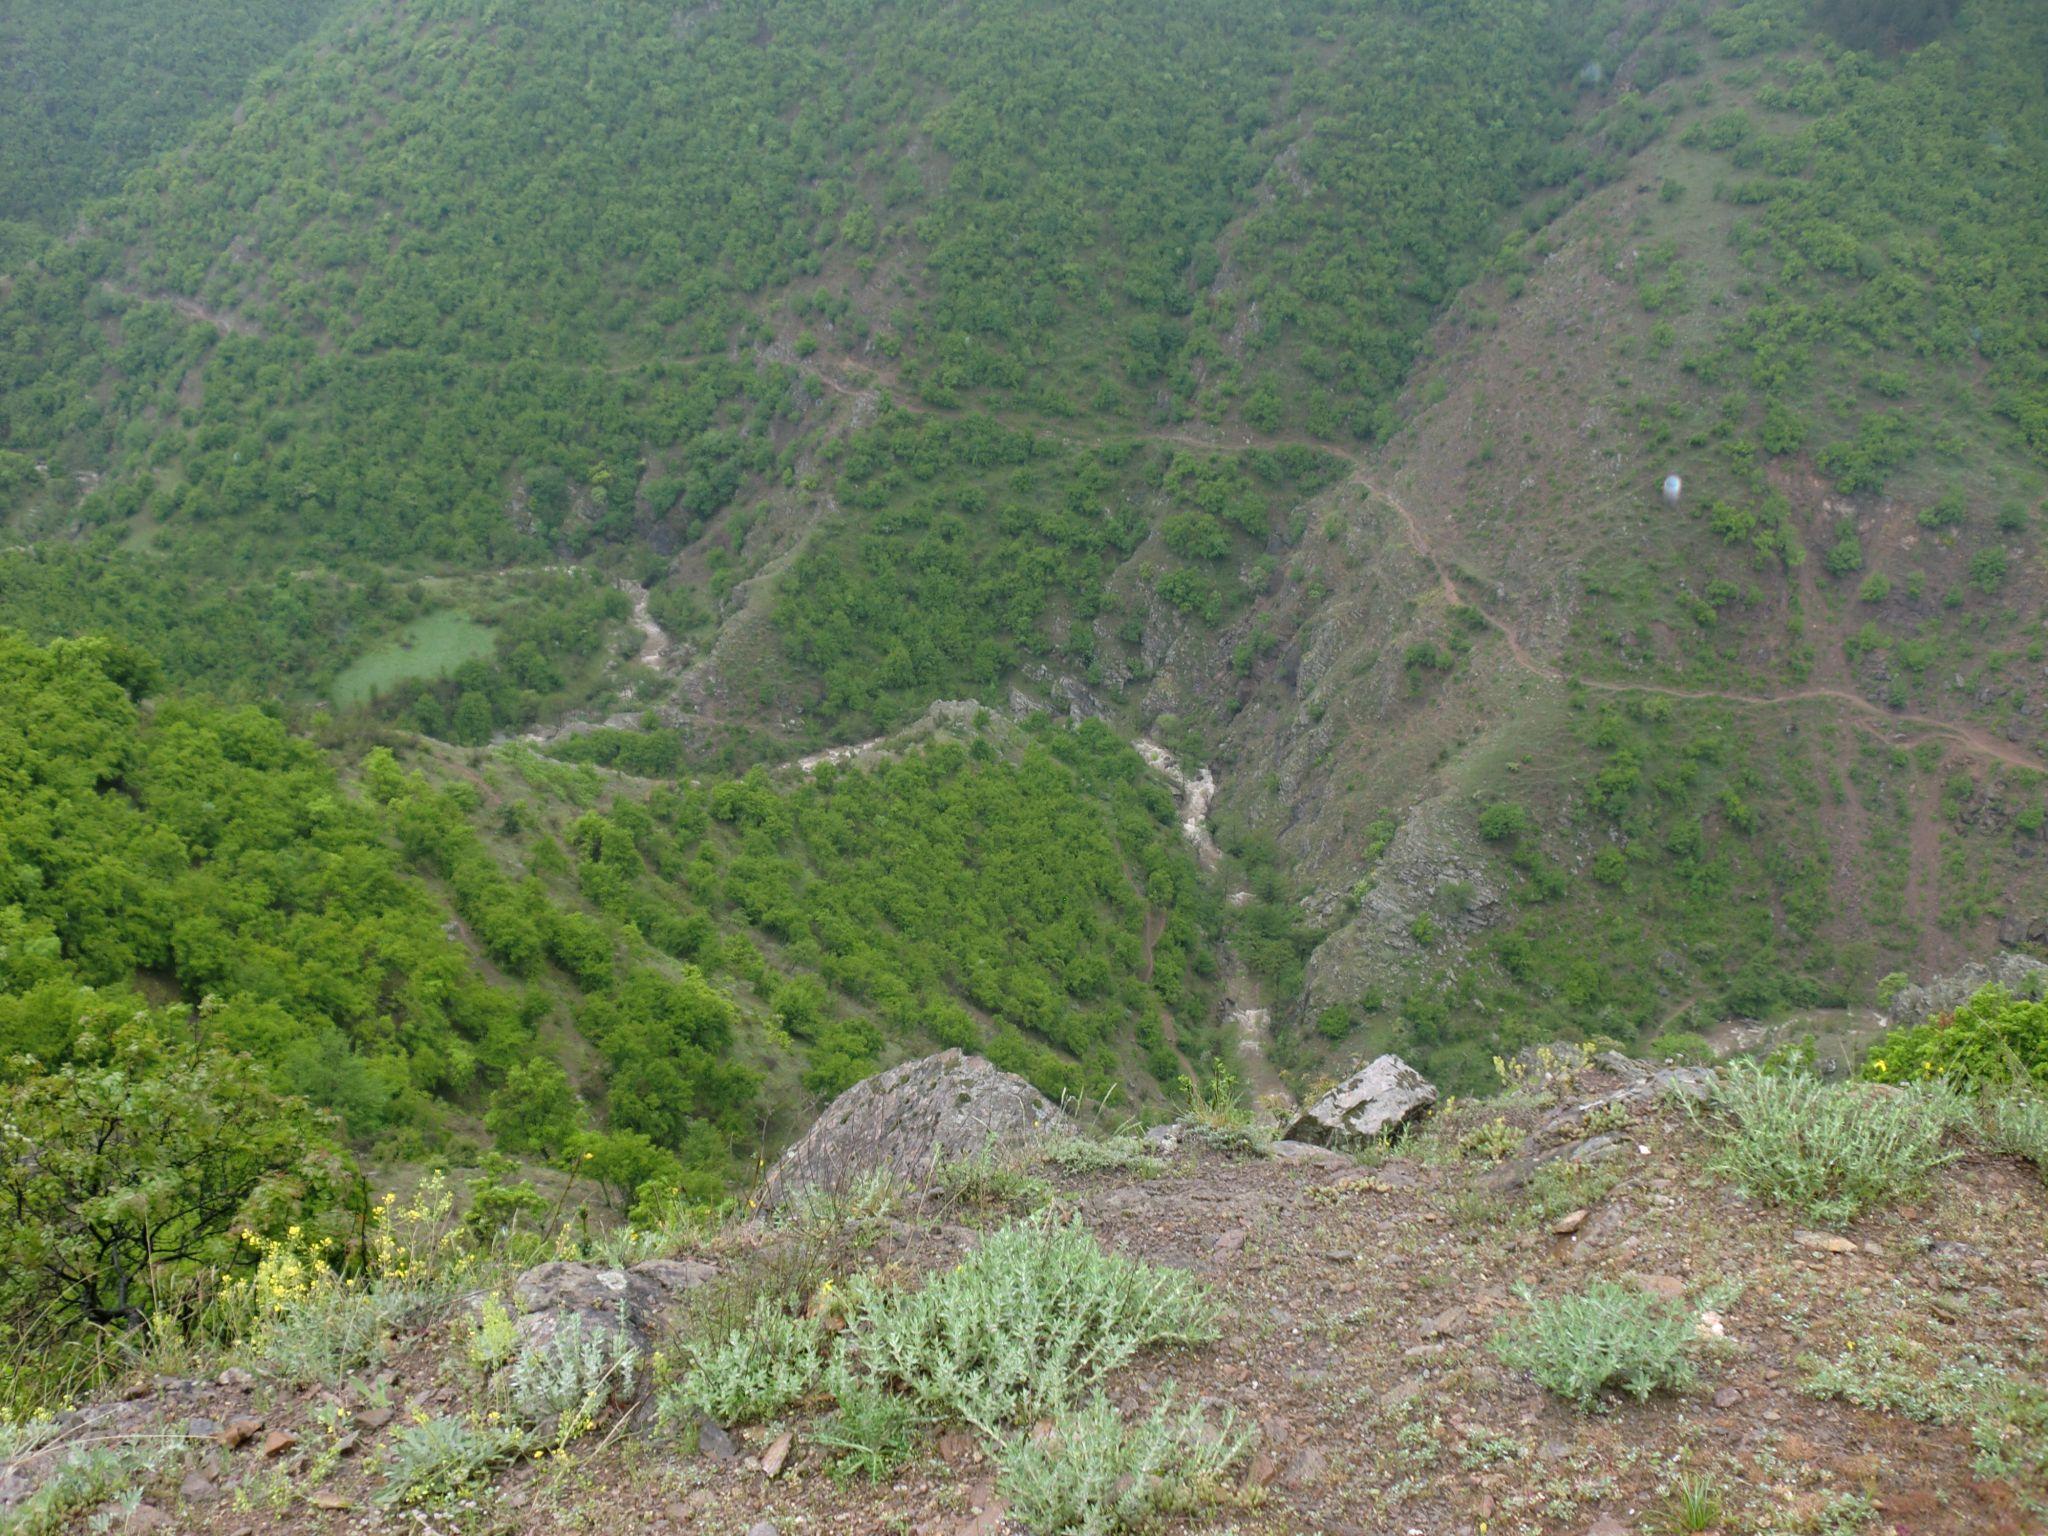 CIMG4415 - Macedonian landscapes